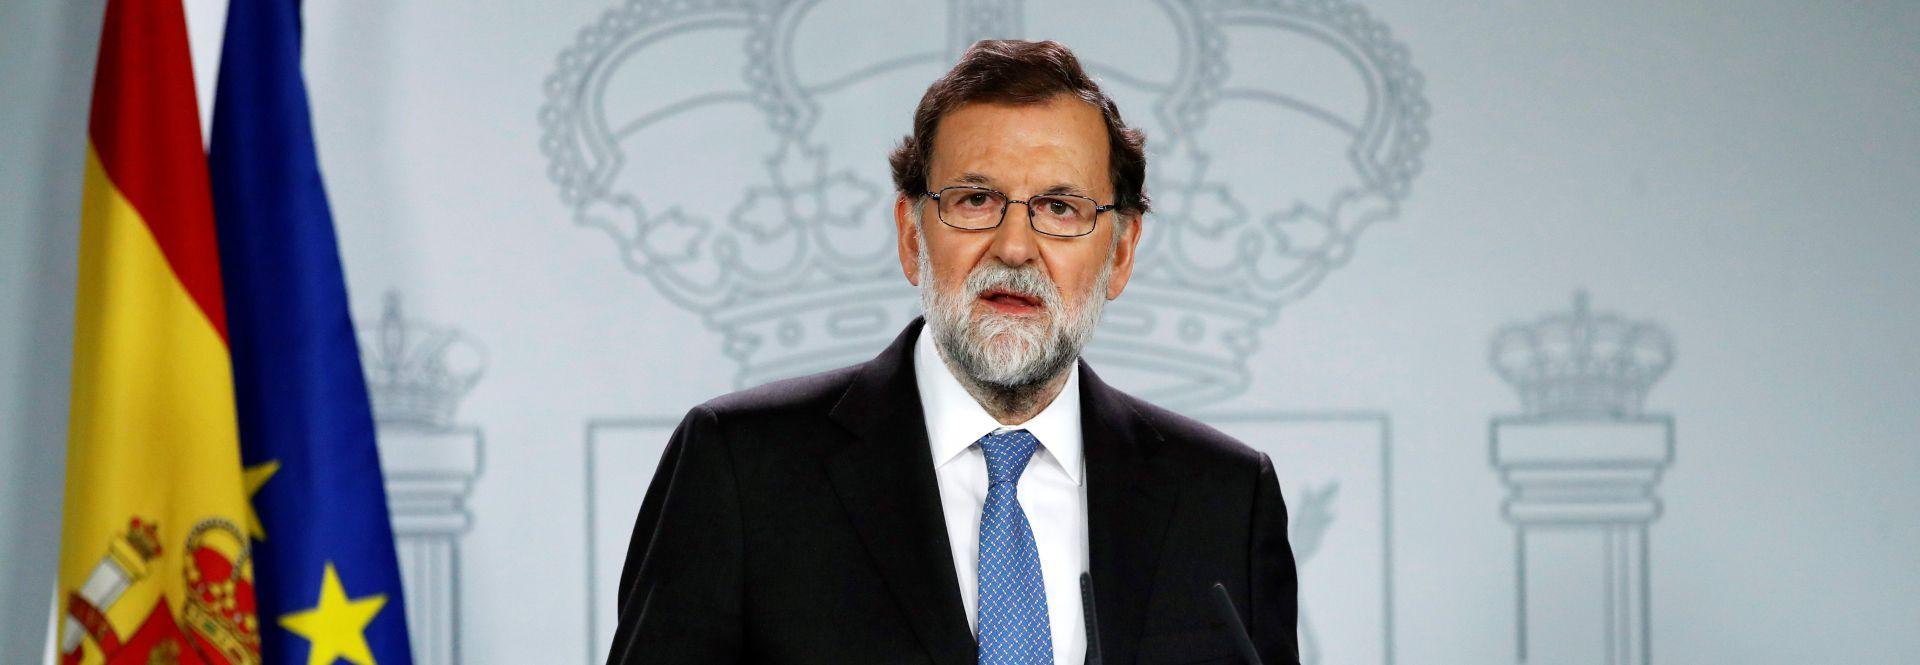 Spain P.M suspends Catalonia's Government